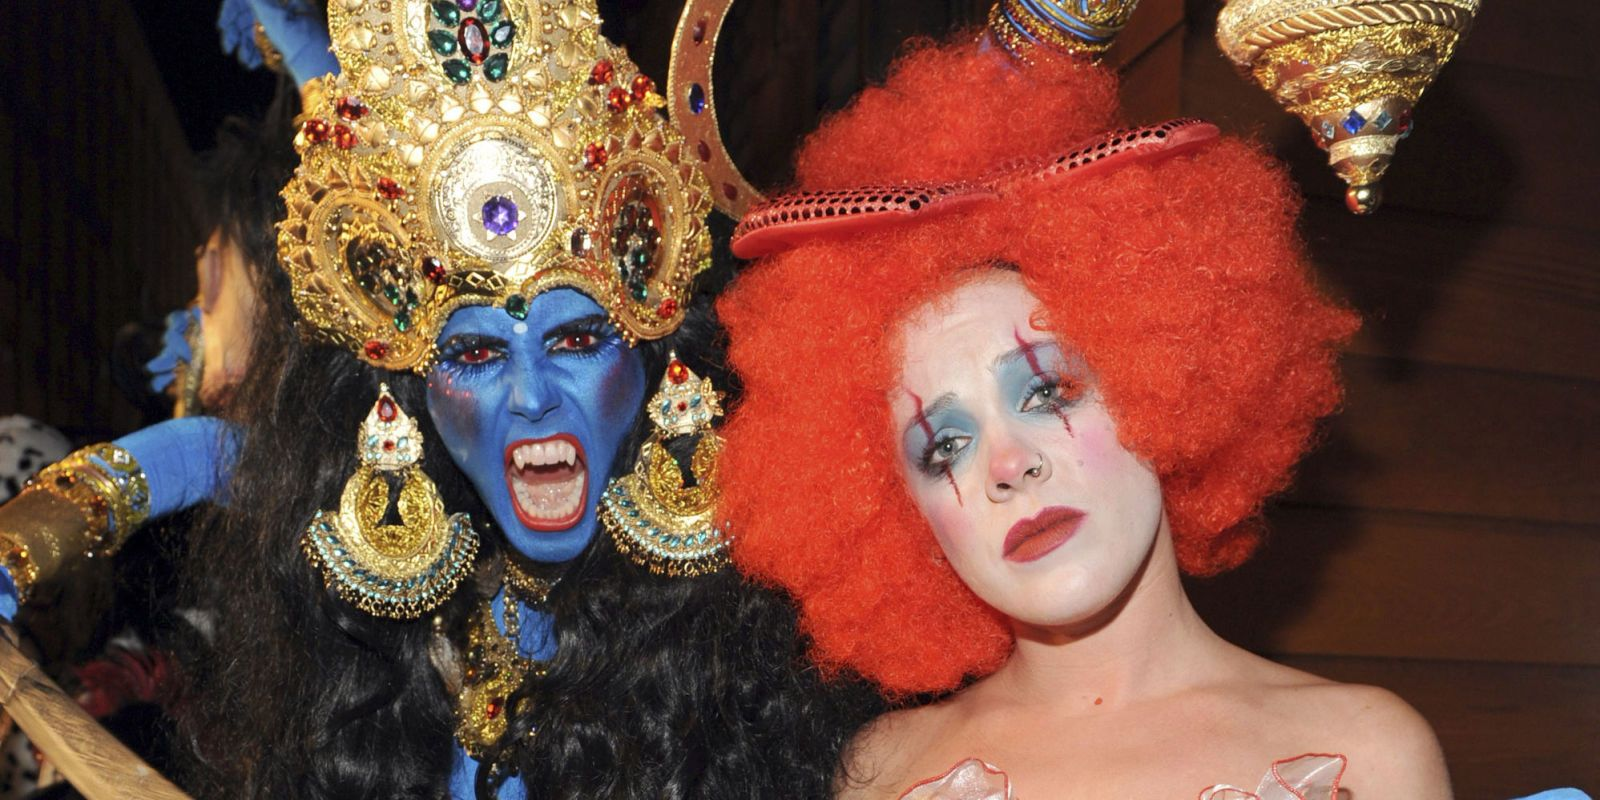 Halloween Party Fancy Dress Zombie Nicholas Cage Celebrity Mask